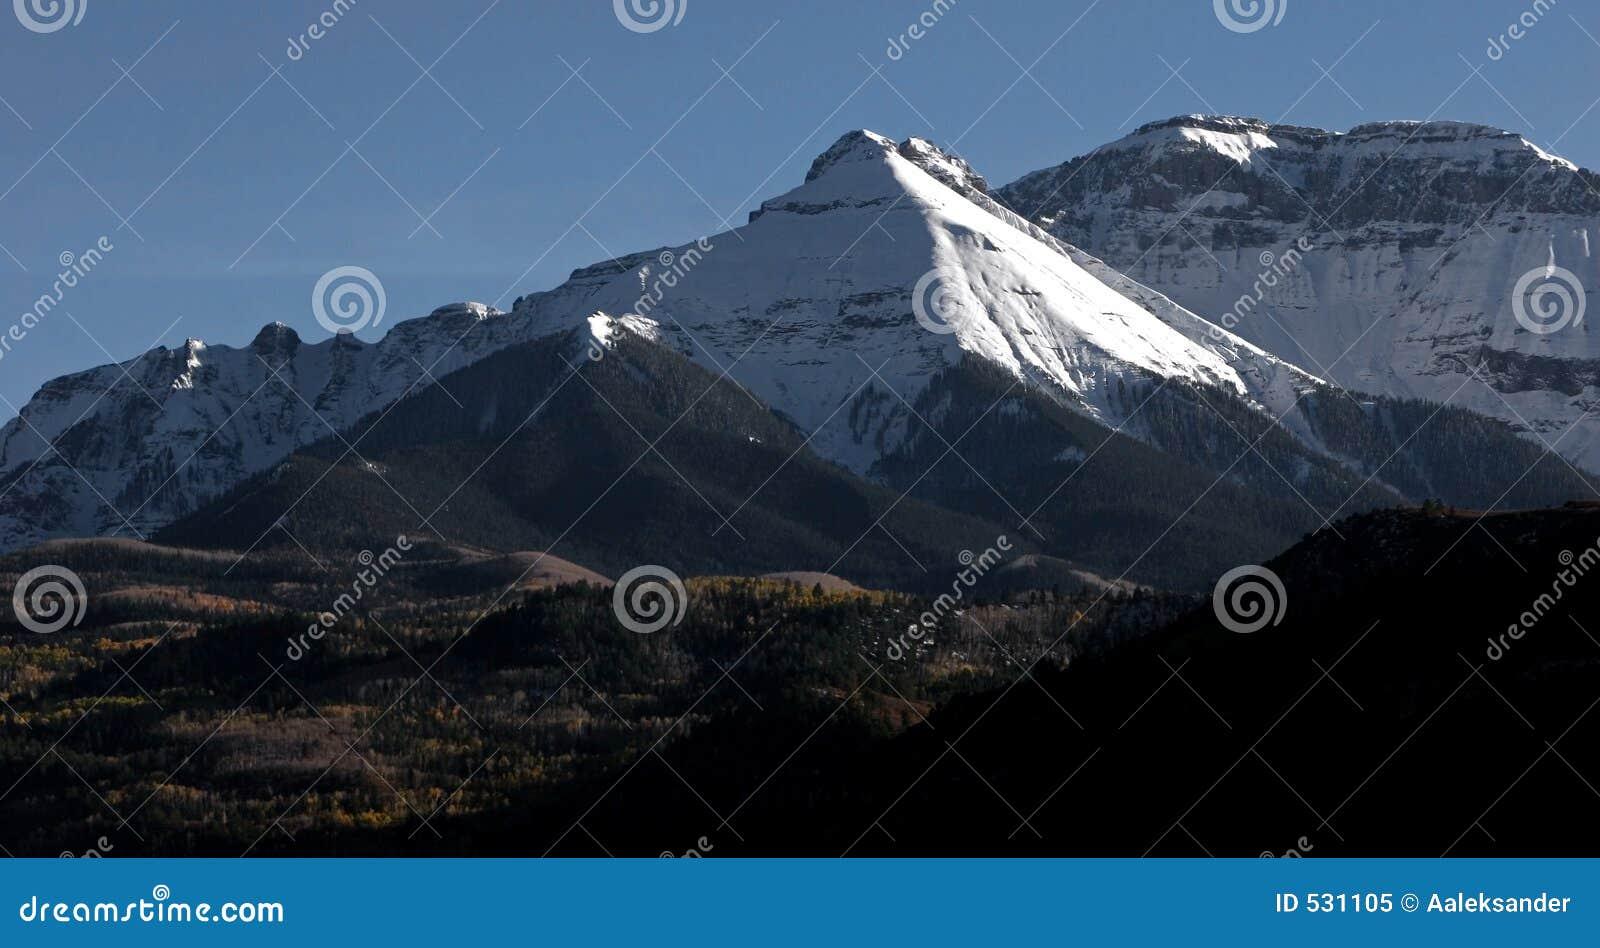 Download 科罗拉多 库存图片. 图片 包括有 日落, 罗基斯, 高涨, 滑雪, 横向, 通过, 修改, beautifuler - 531105